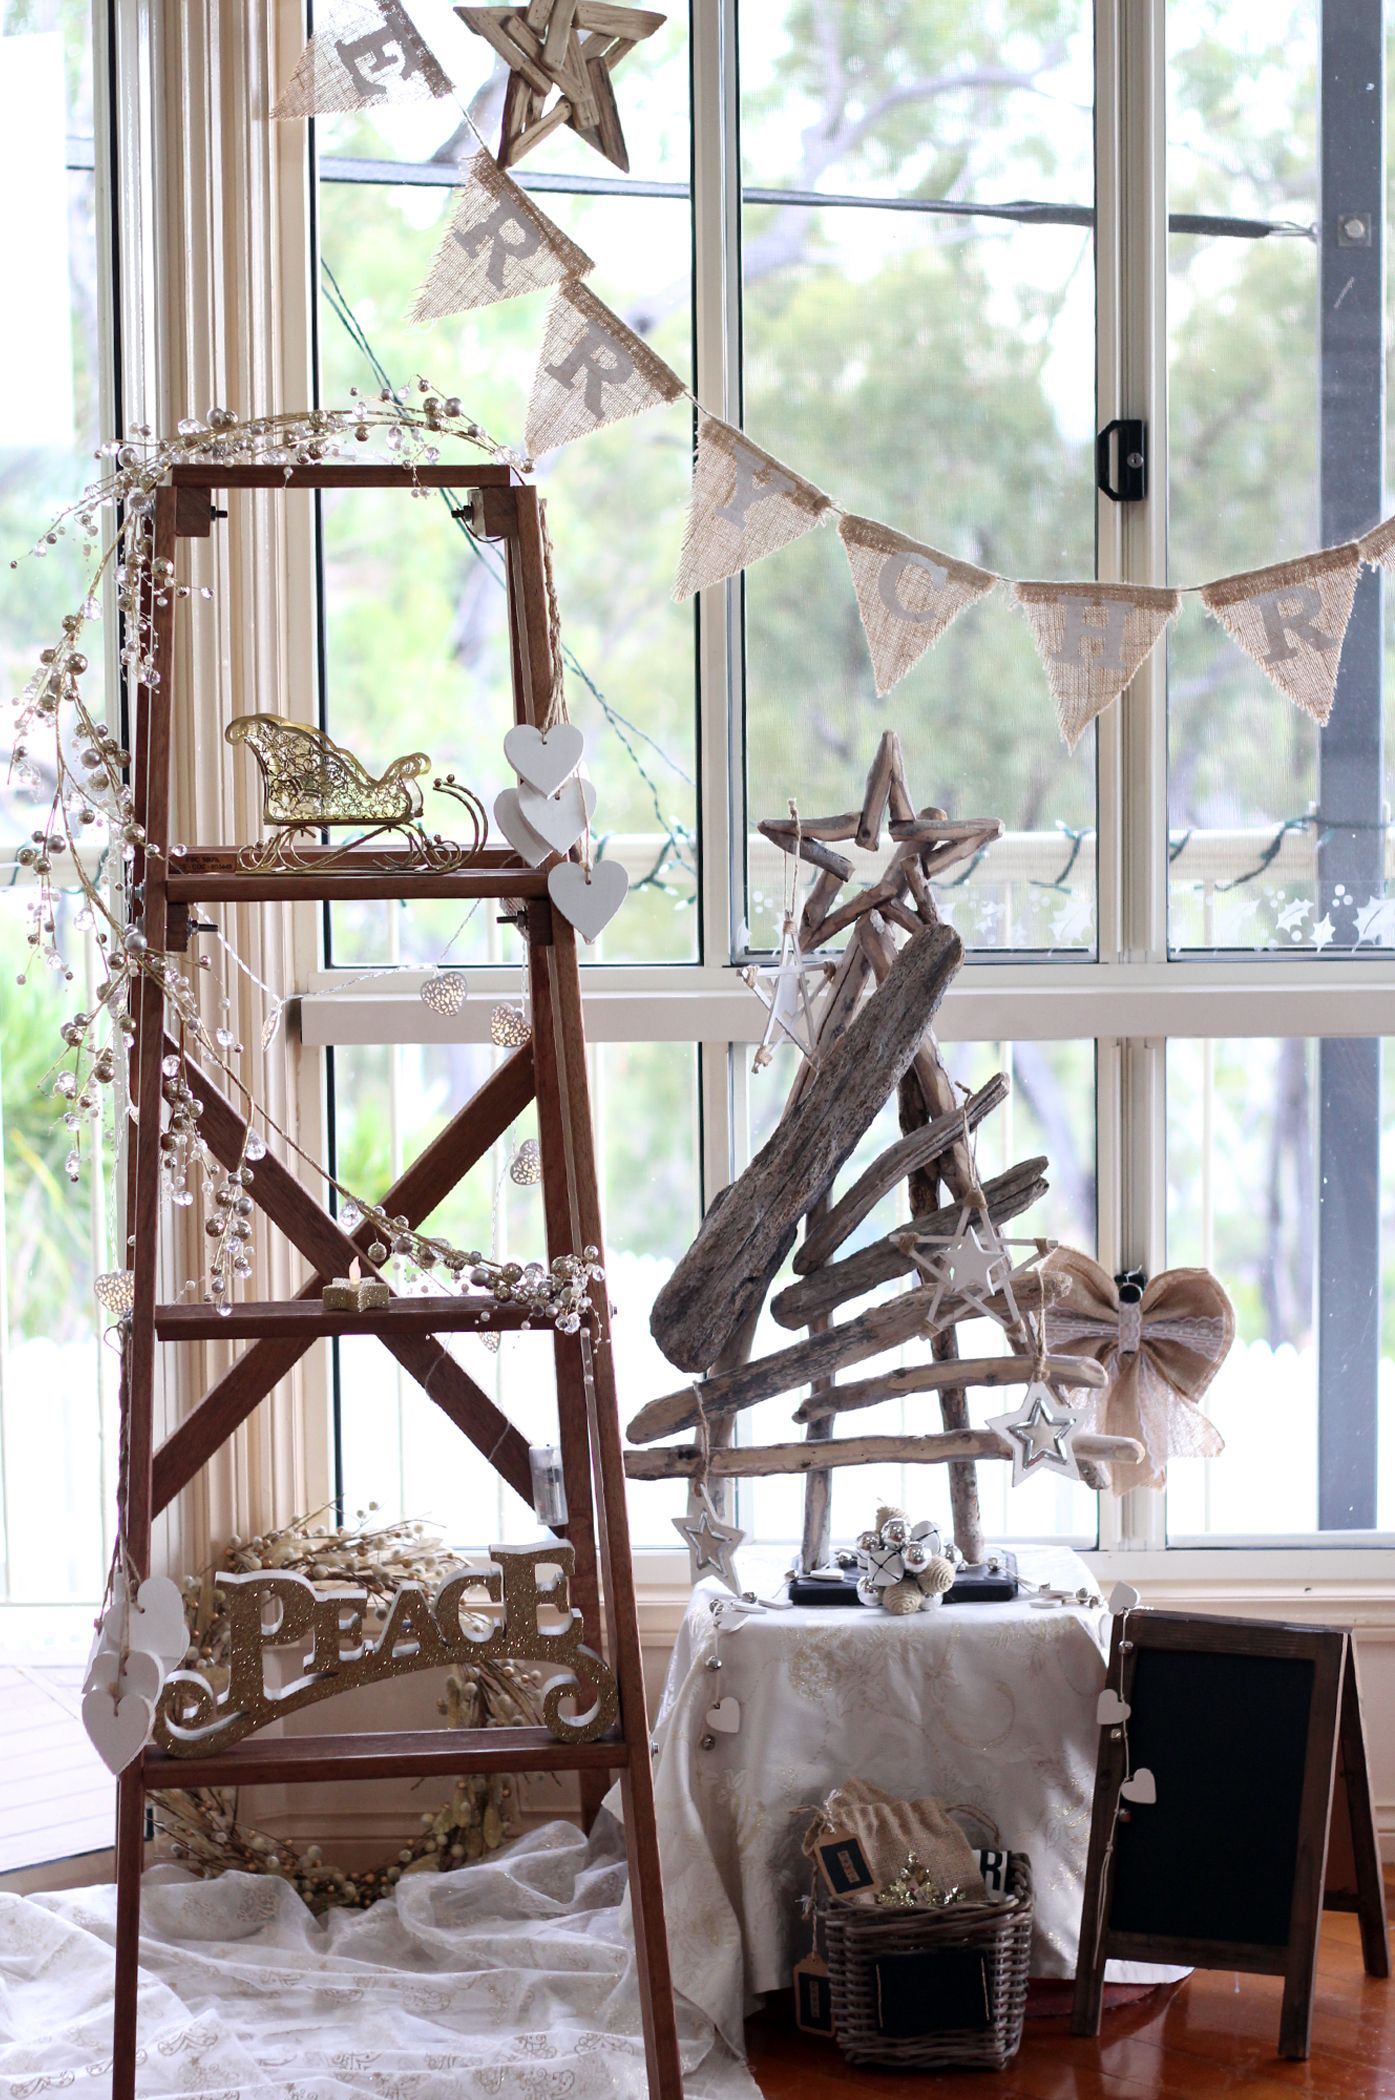 Rustic Christmas, Christmas Ladder, Driftwood Christmas Tree, Chalkboard Christmas, Burlap Christmas